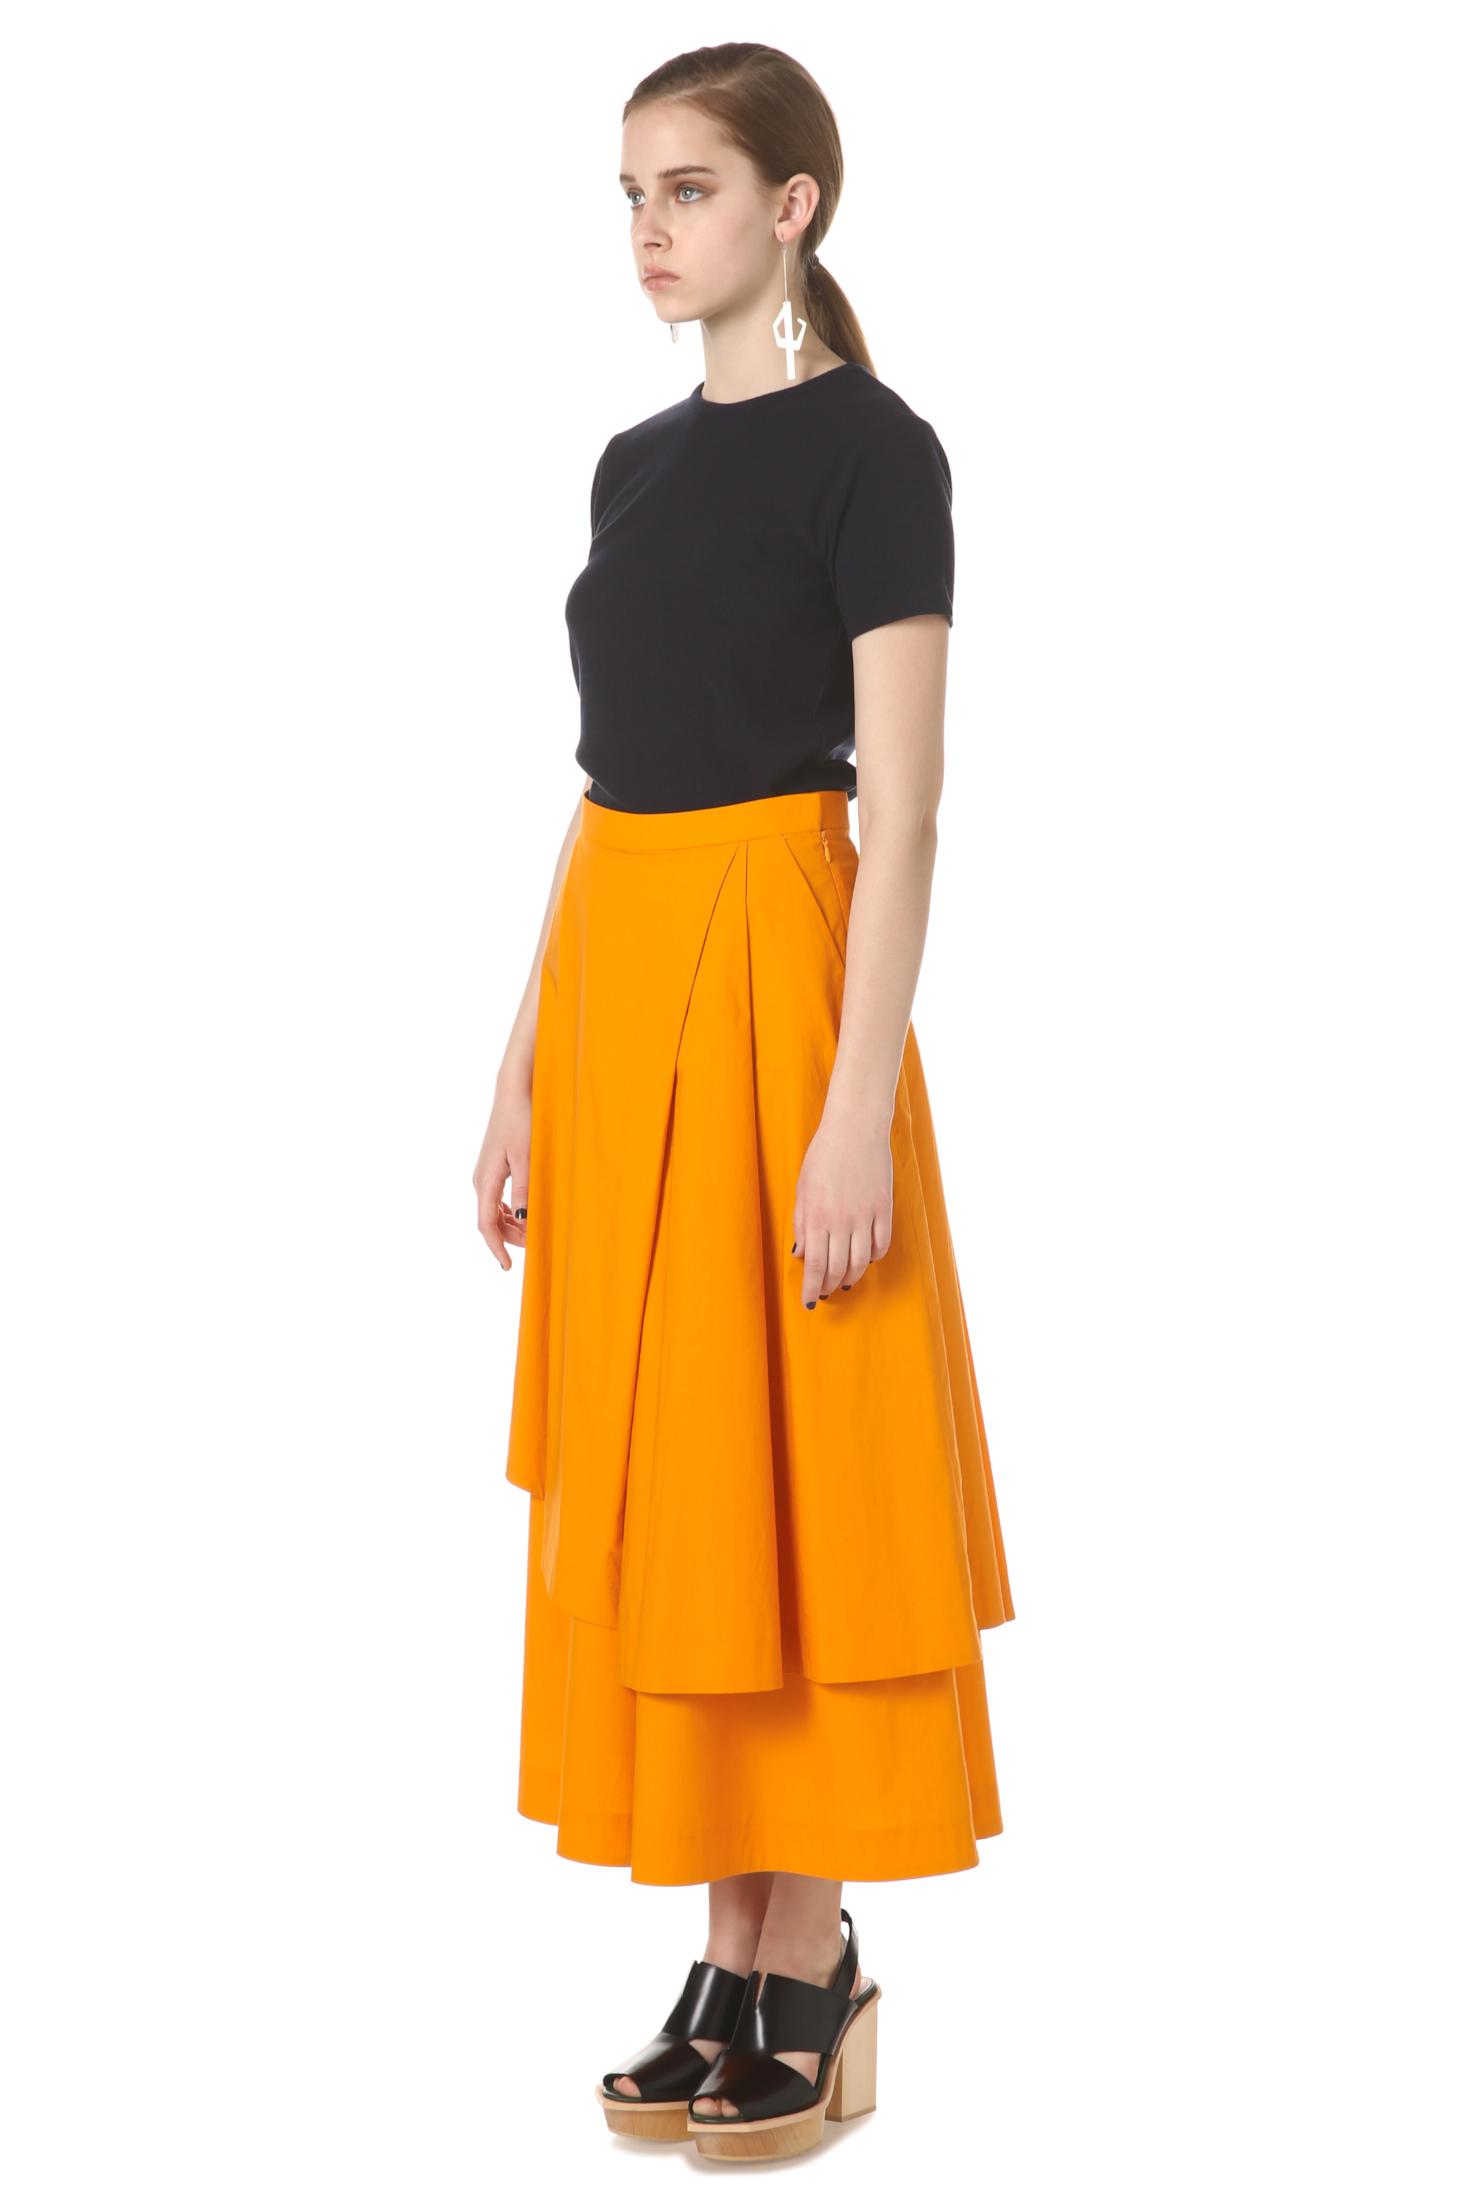 ENFOLDのskirt